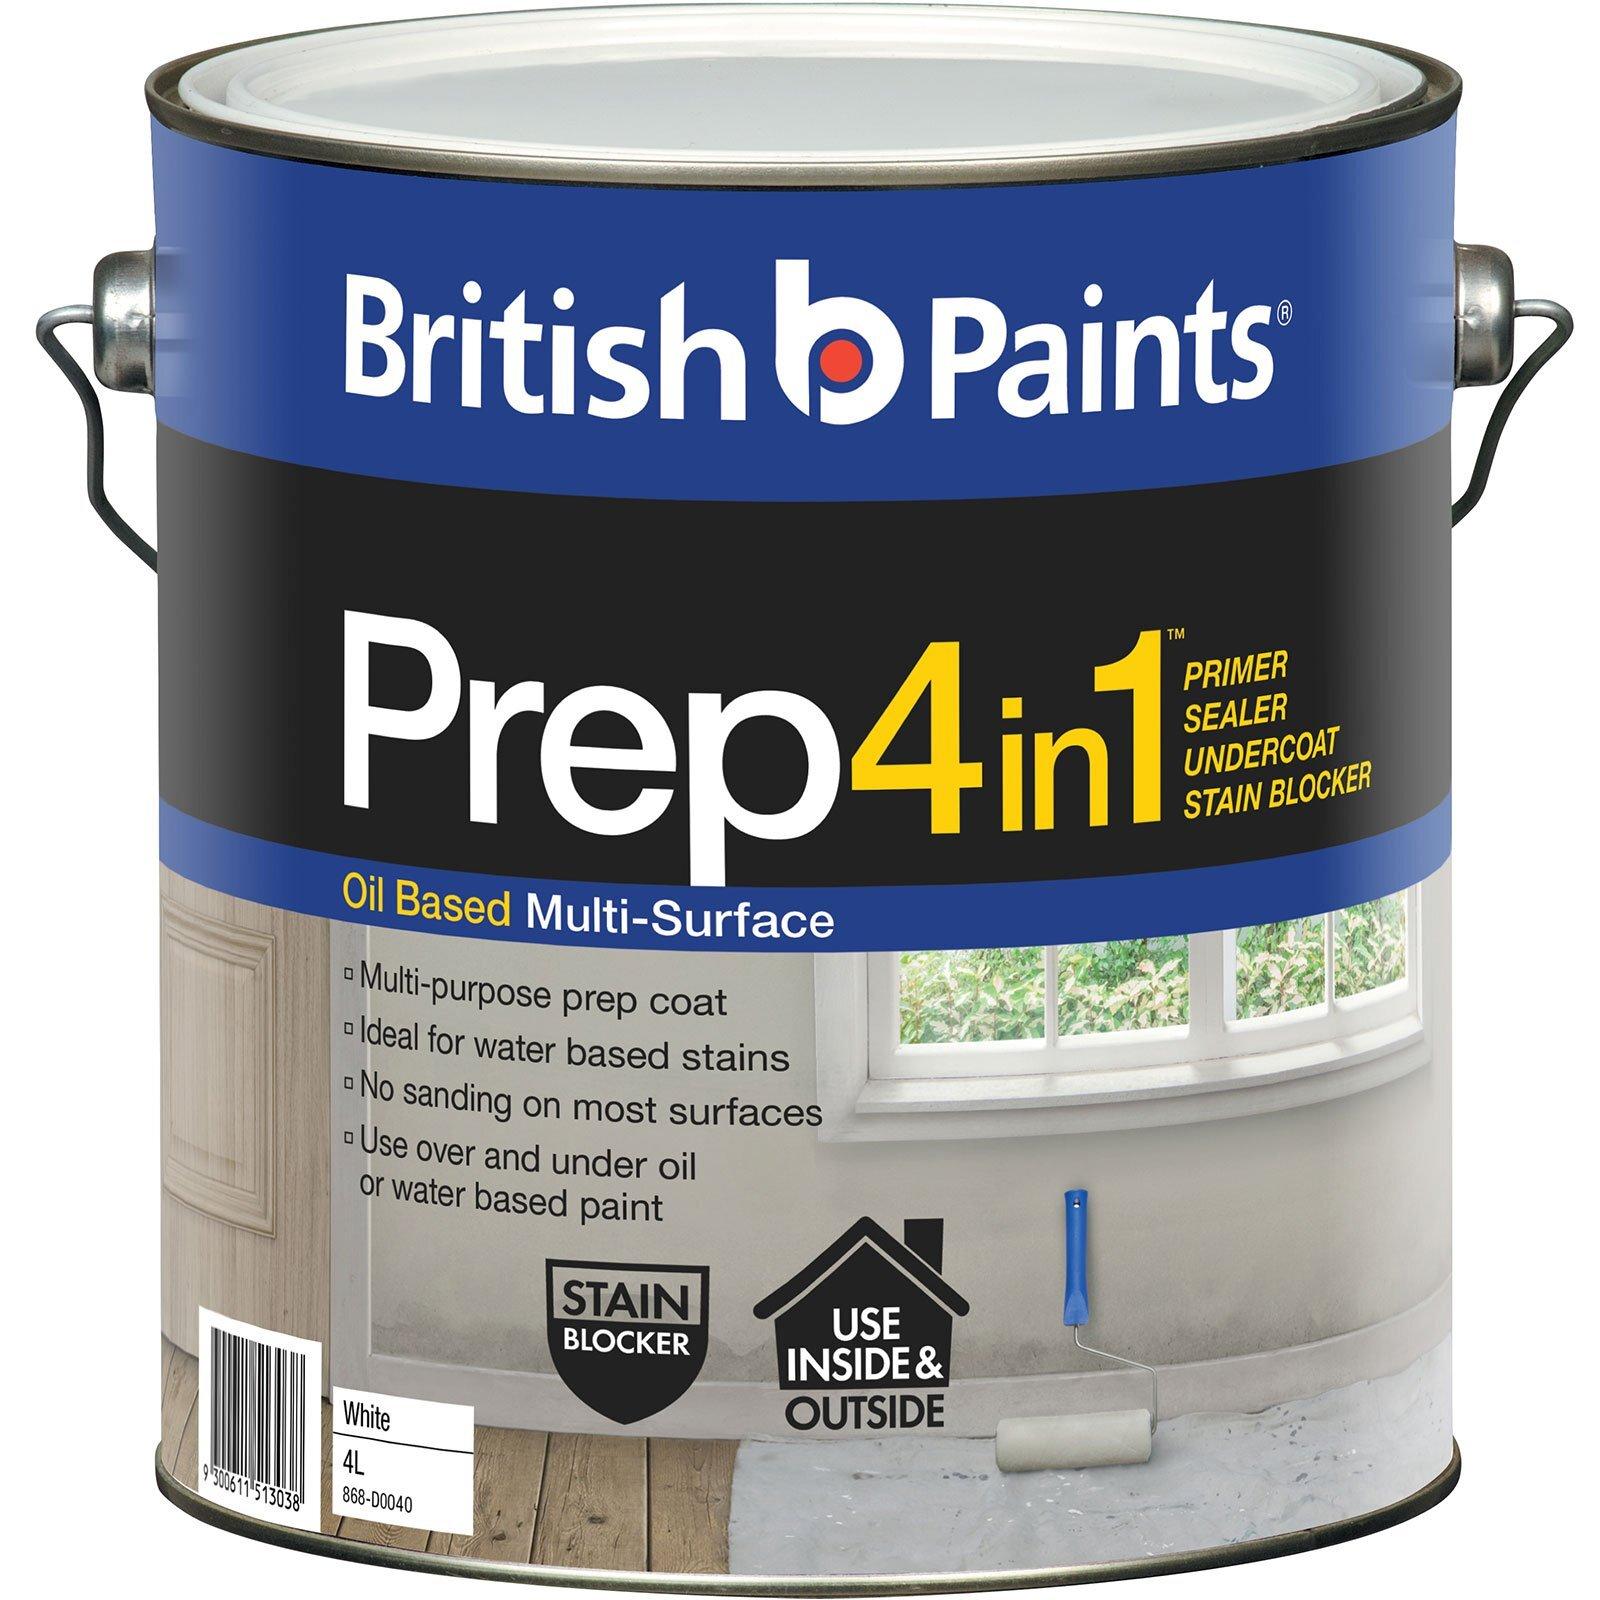 British Paints 4L Prep 4 In 1  White Oil-Based Primer Sealer Undercoat